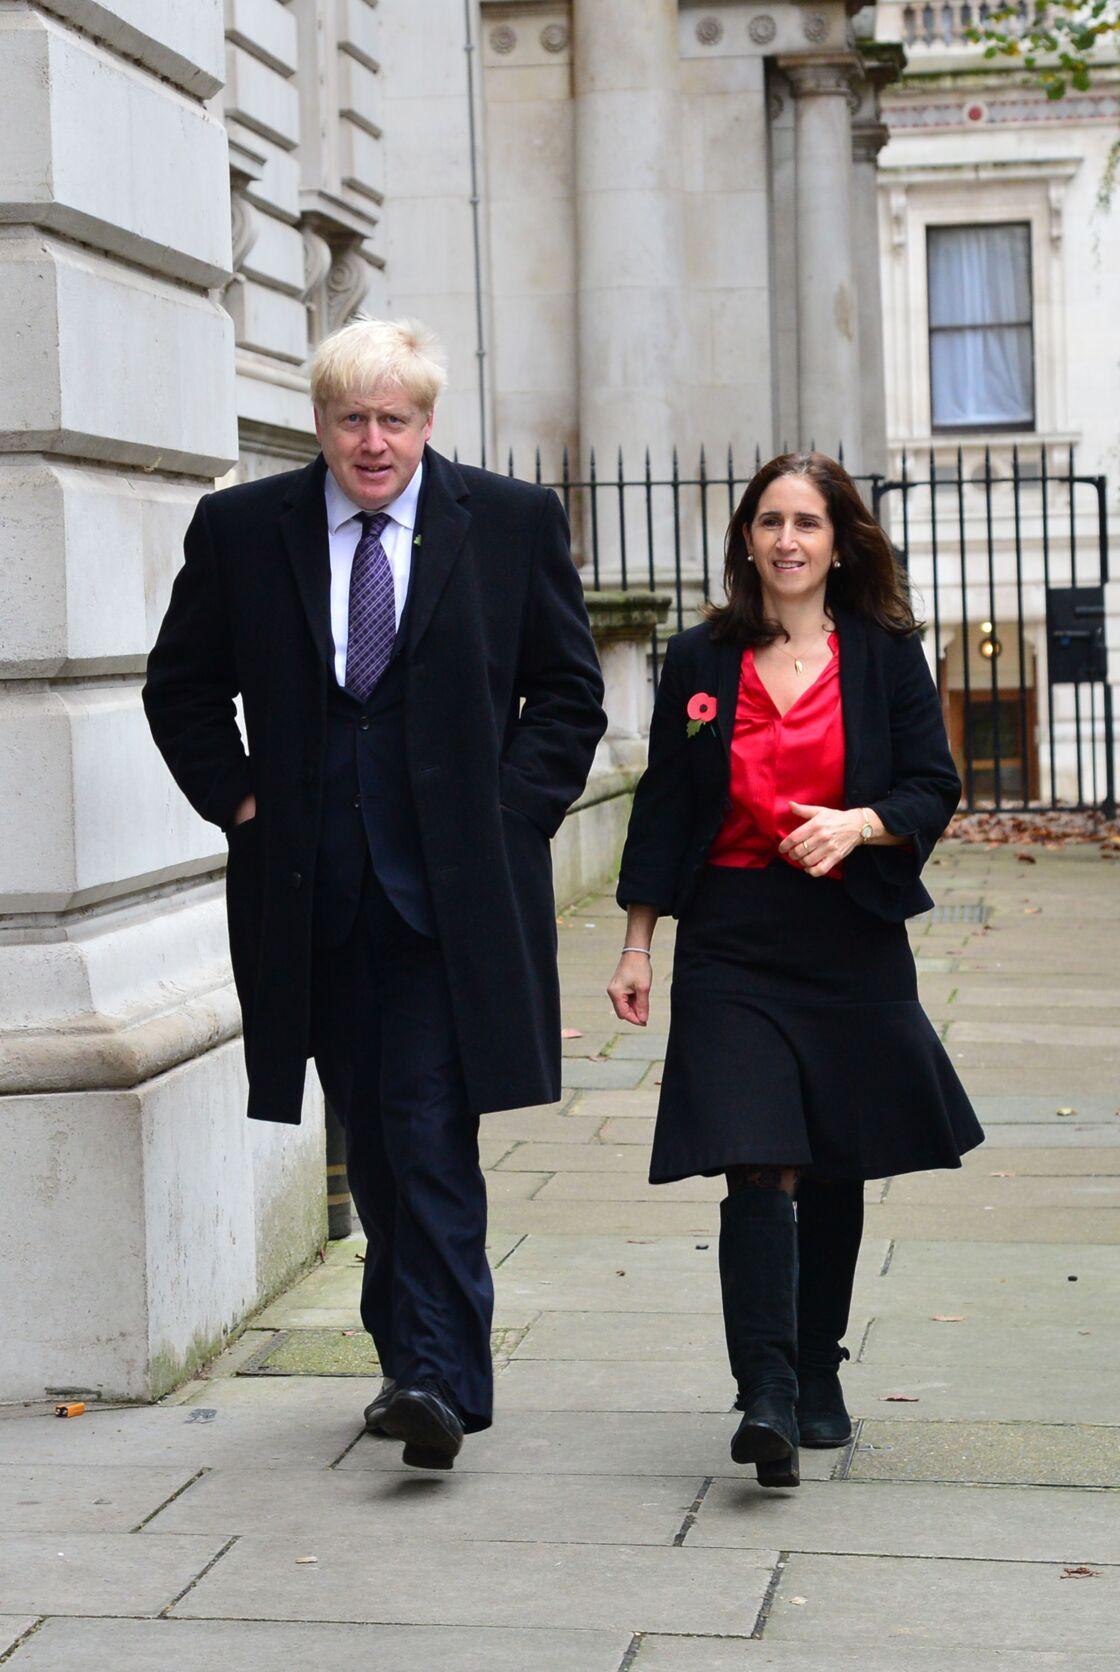 Boris Johnson et son ex-femme Marina Johnson le 8 novembre 2015